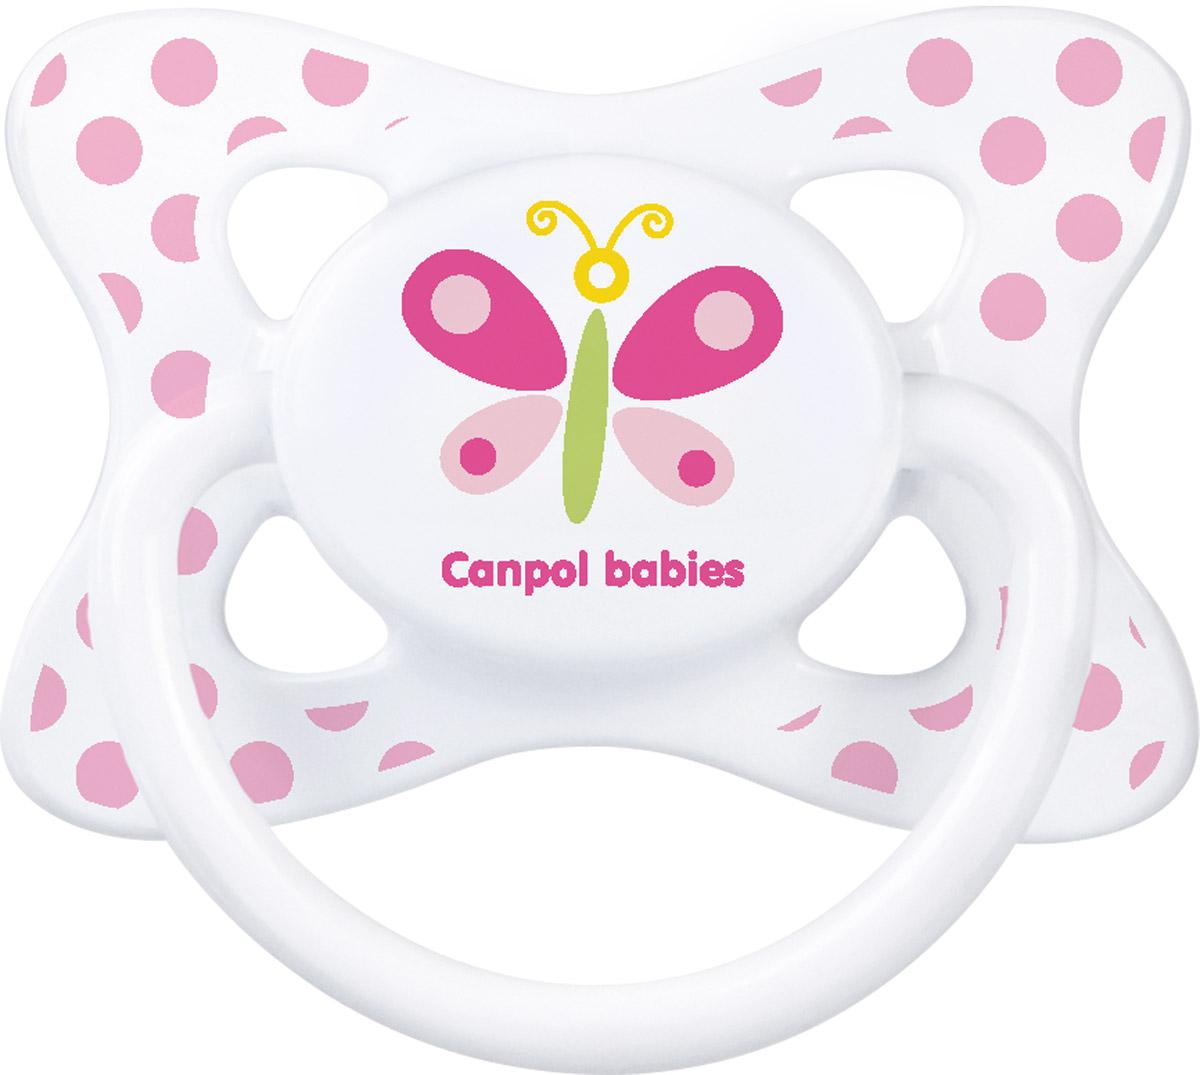 Canpol Babies Пустышка латексная Бабочка от 6 до 18 месяцев пустышки canpol латексная волшебная сказка 0 6 мес 22 603